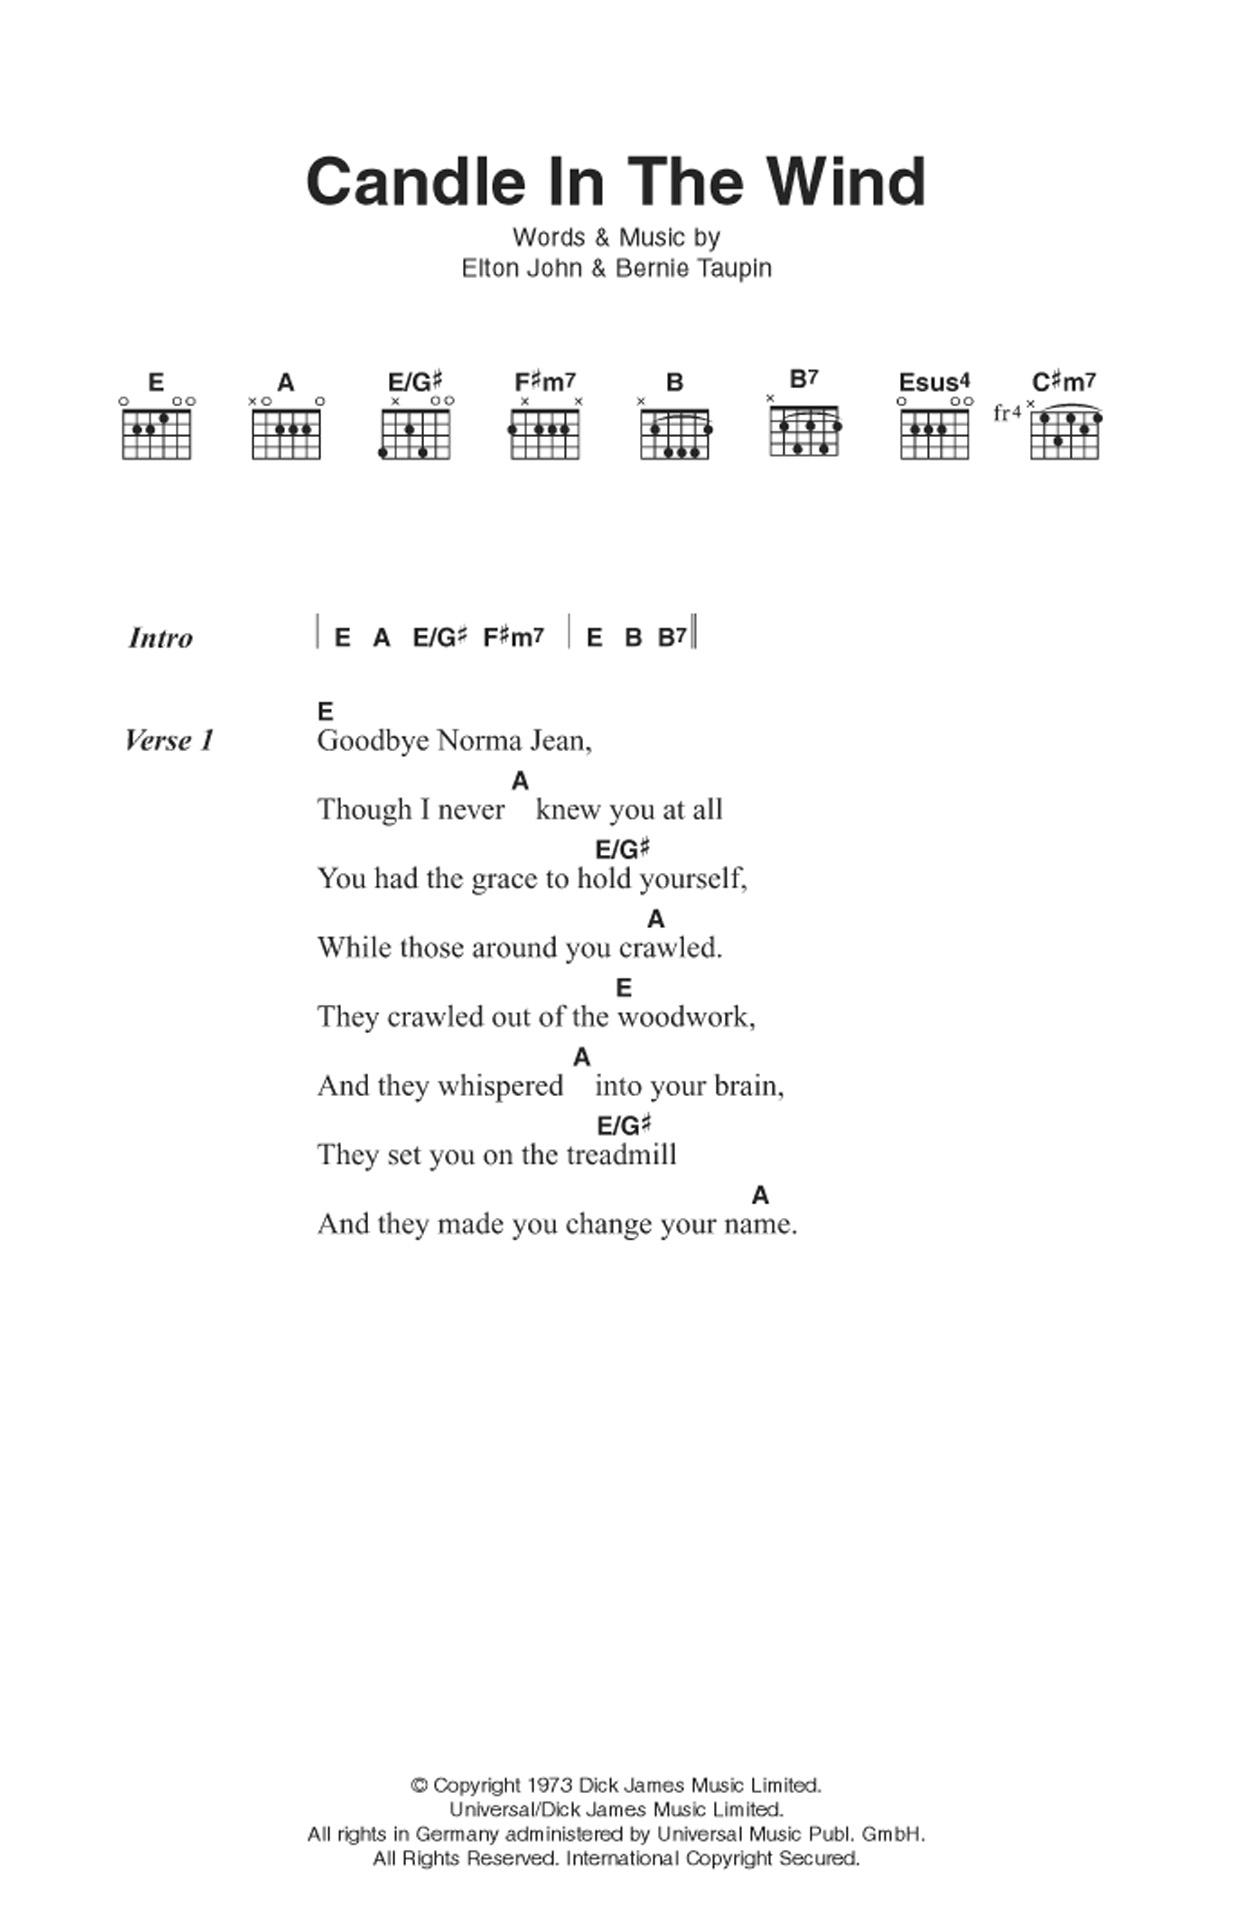 Candle In The Wind Sheet Music Elton John Lyrics Chords